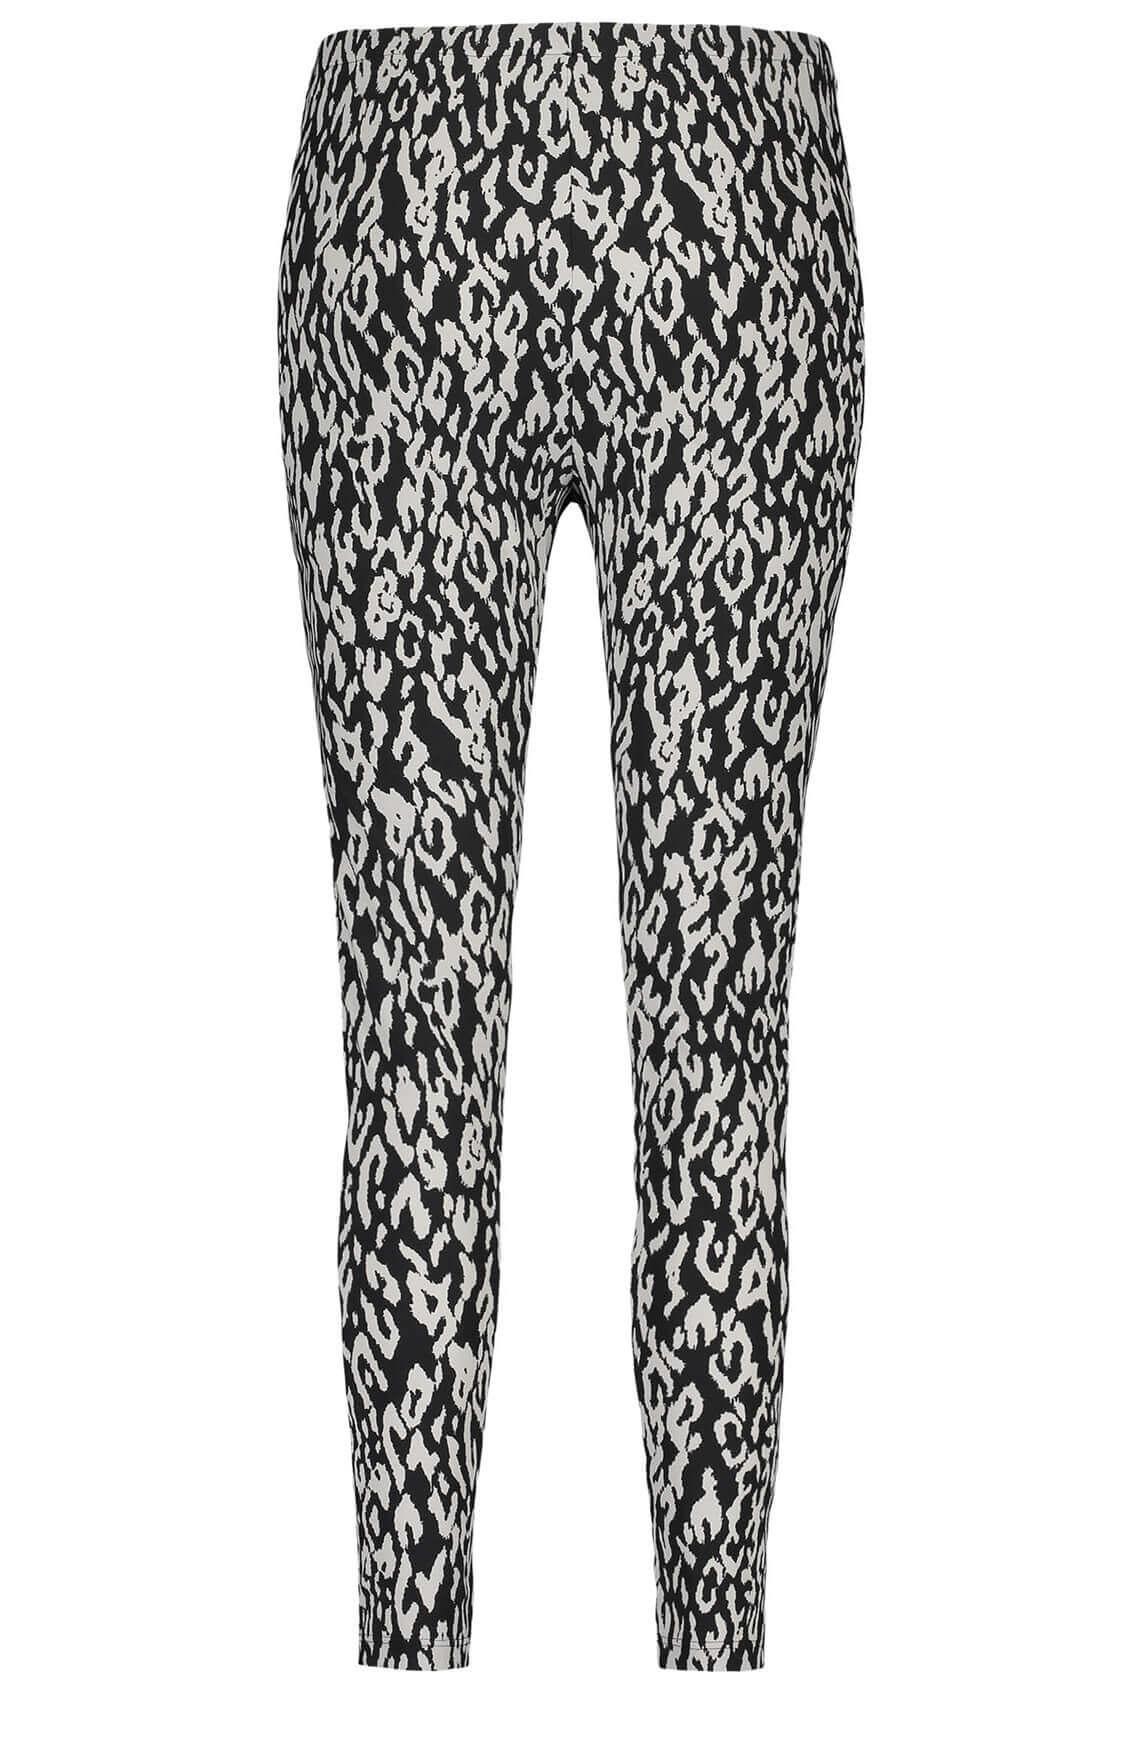 Penn & Ink Dames Legging met animalprint zwart